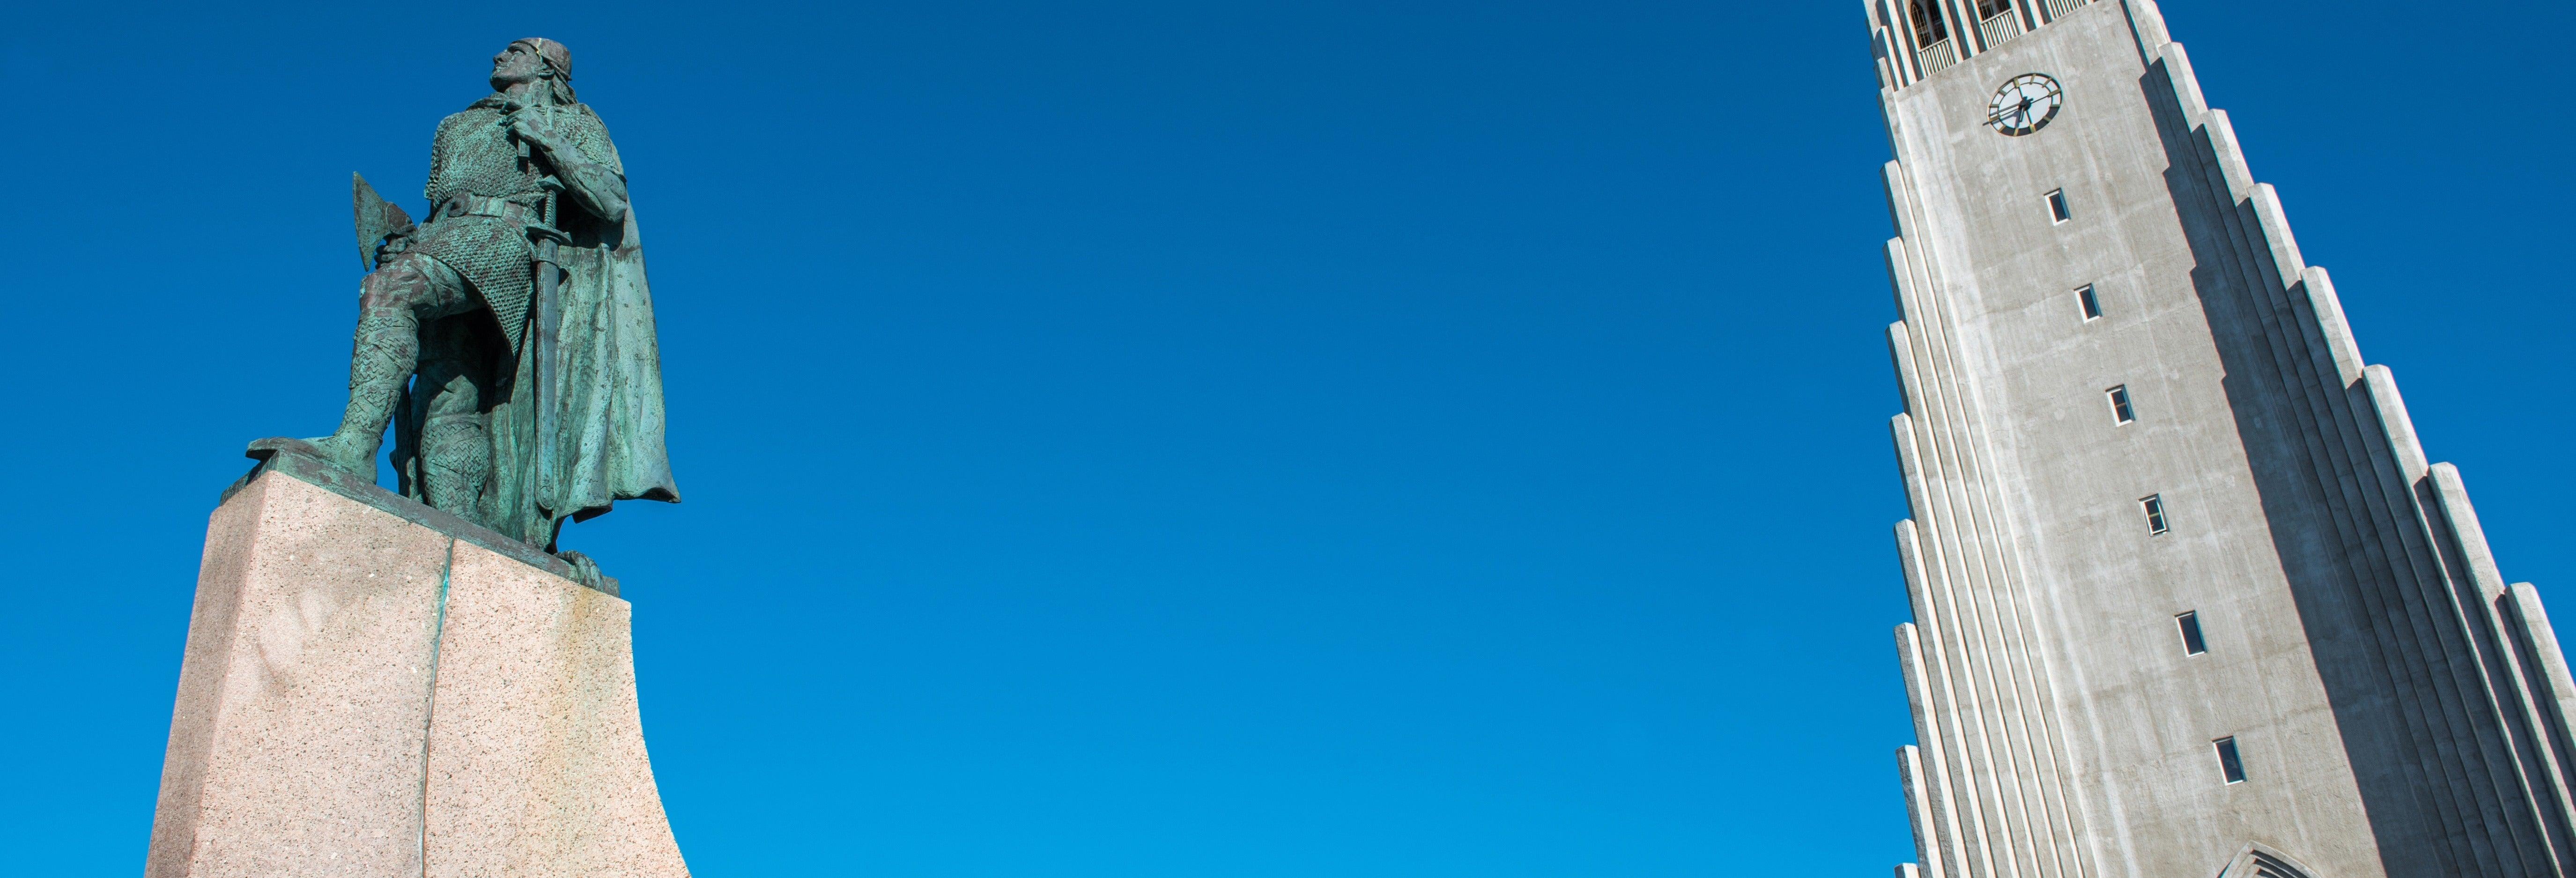 Tour panorâmico por Reykjavík